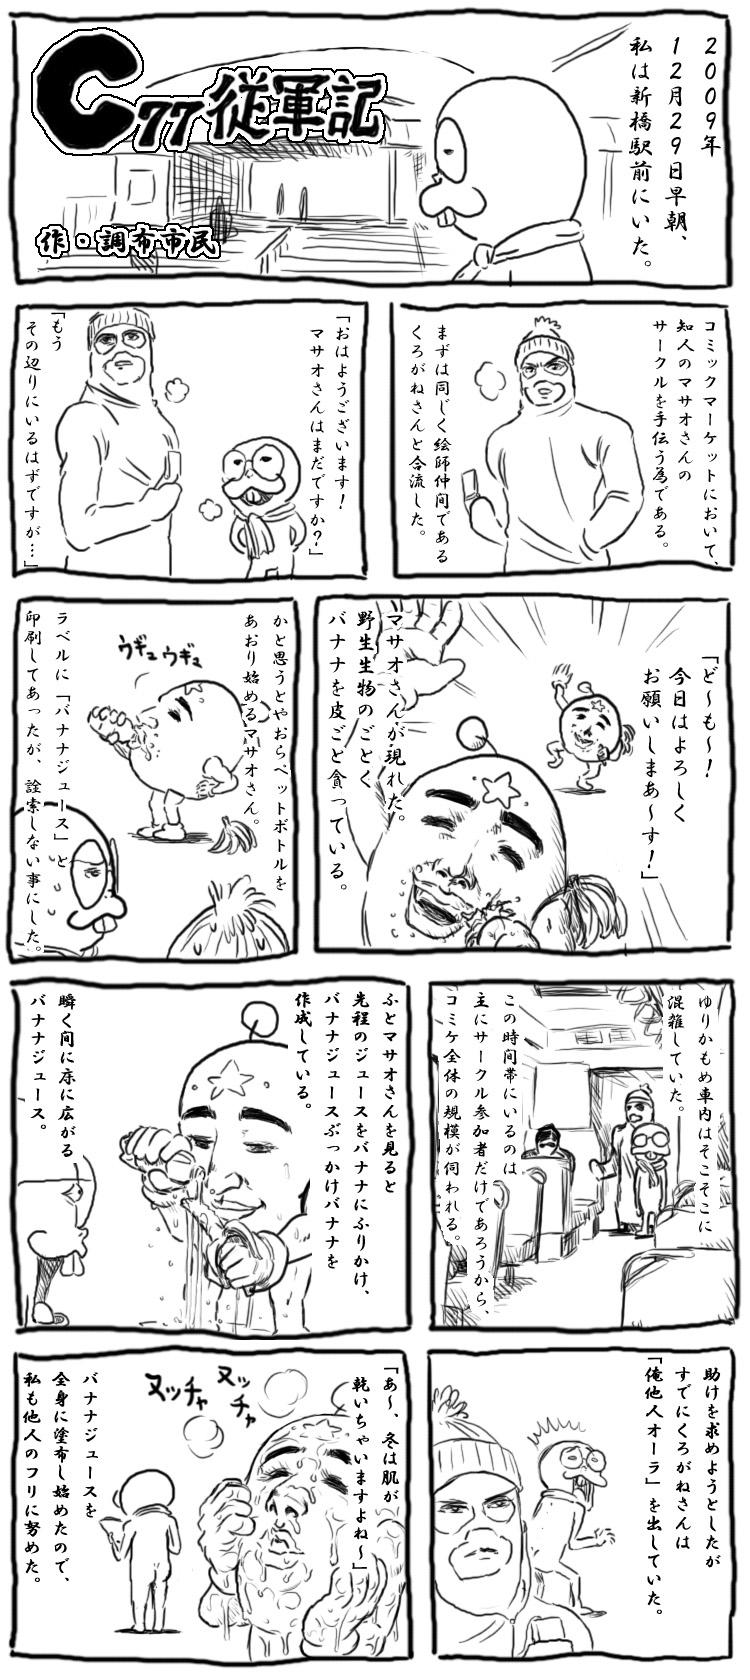 offrepoforblog01.jpg